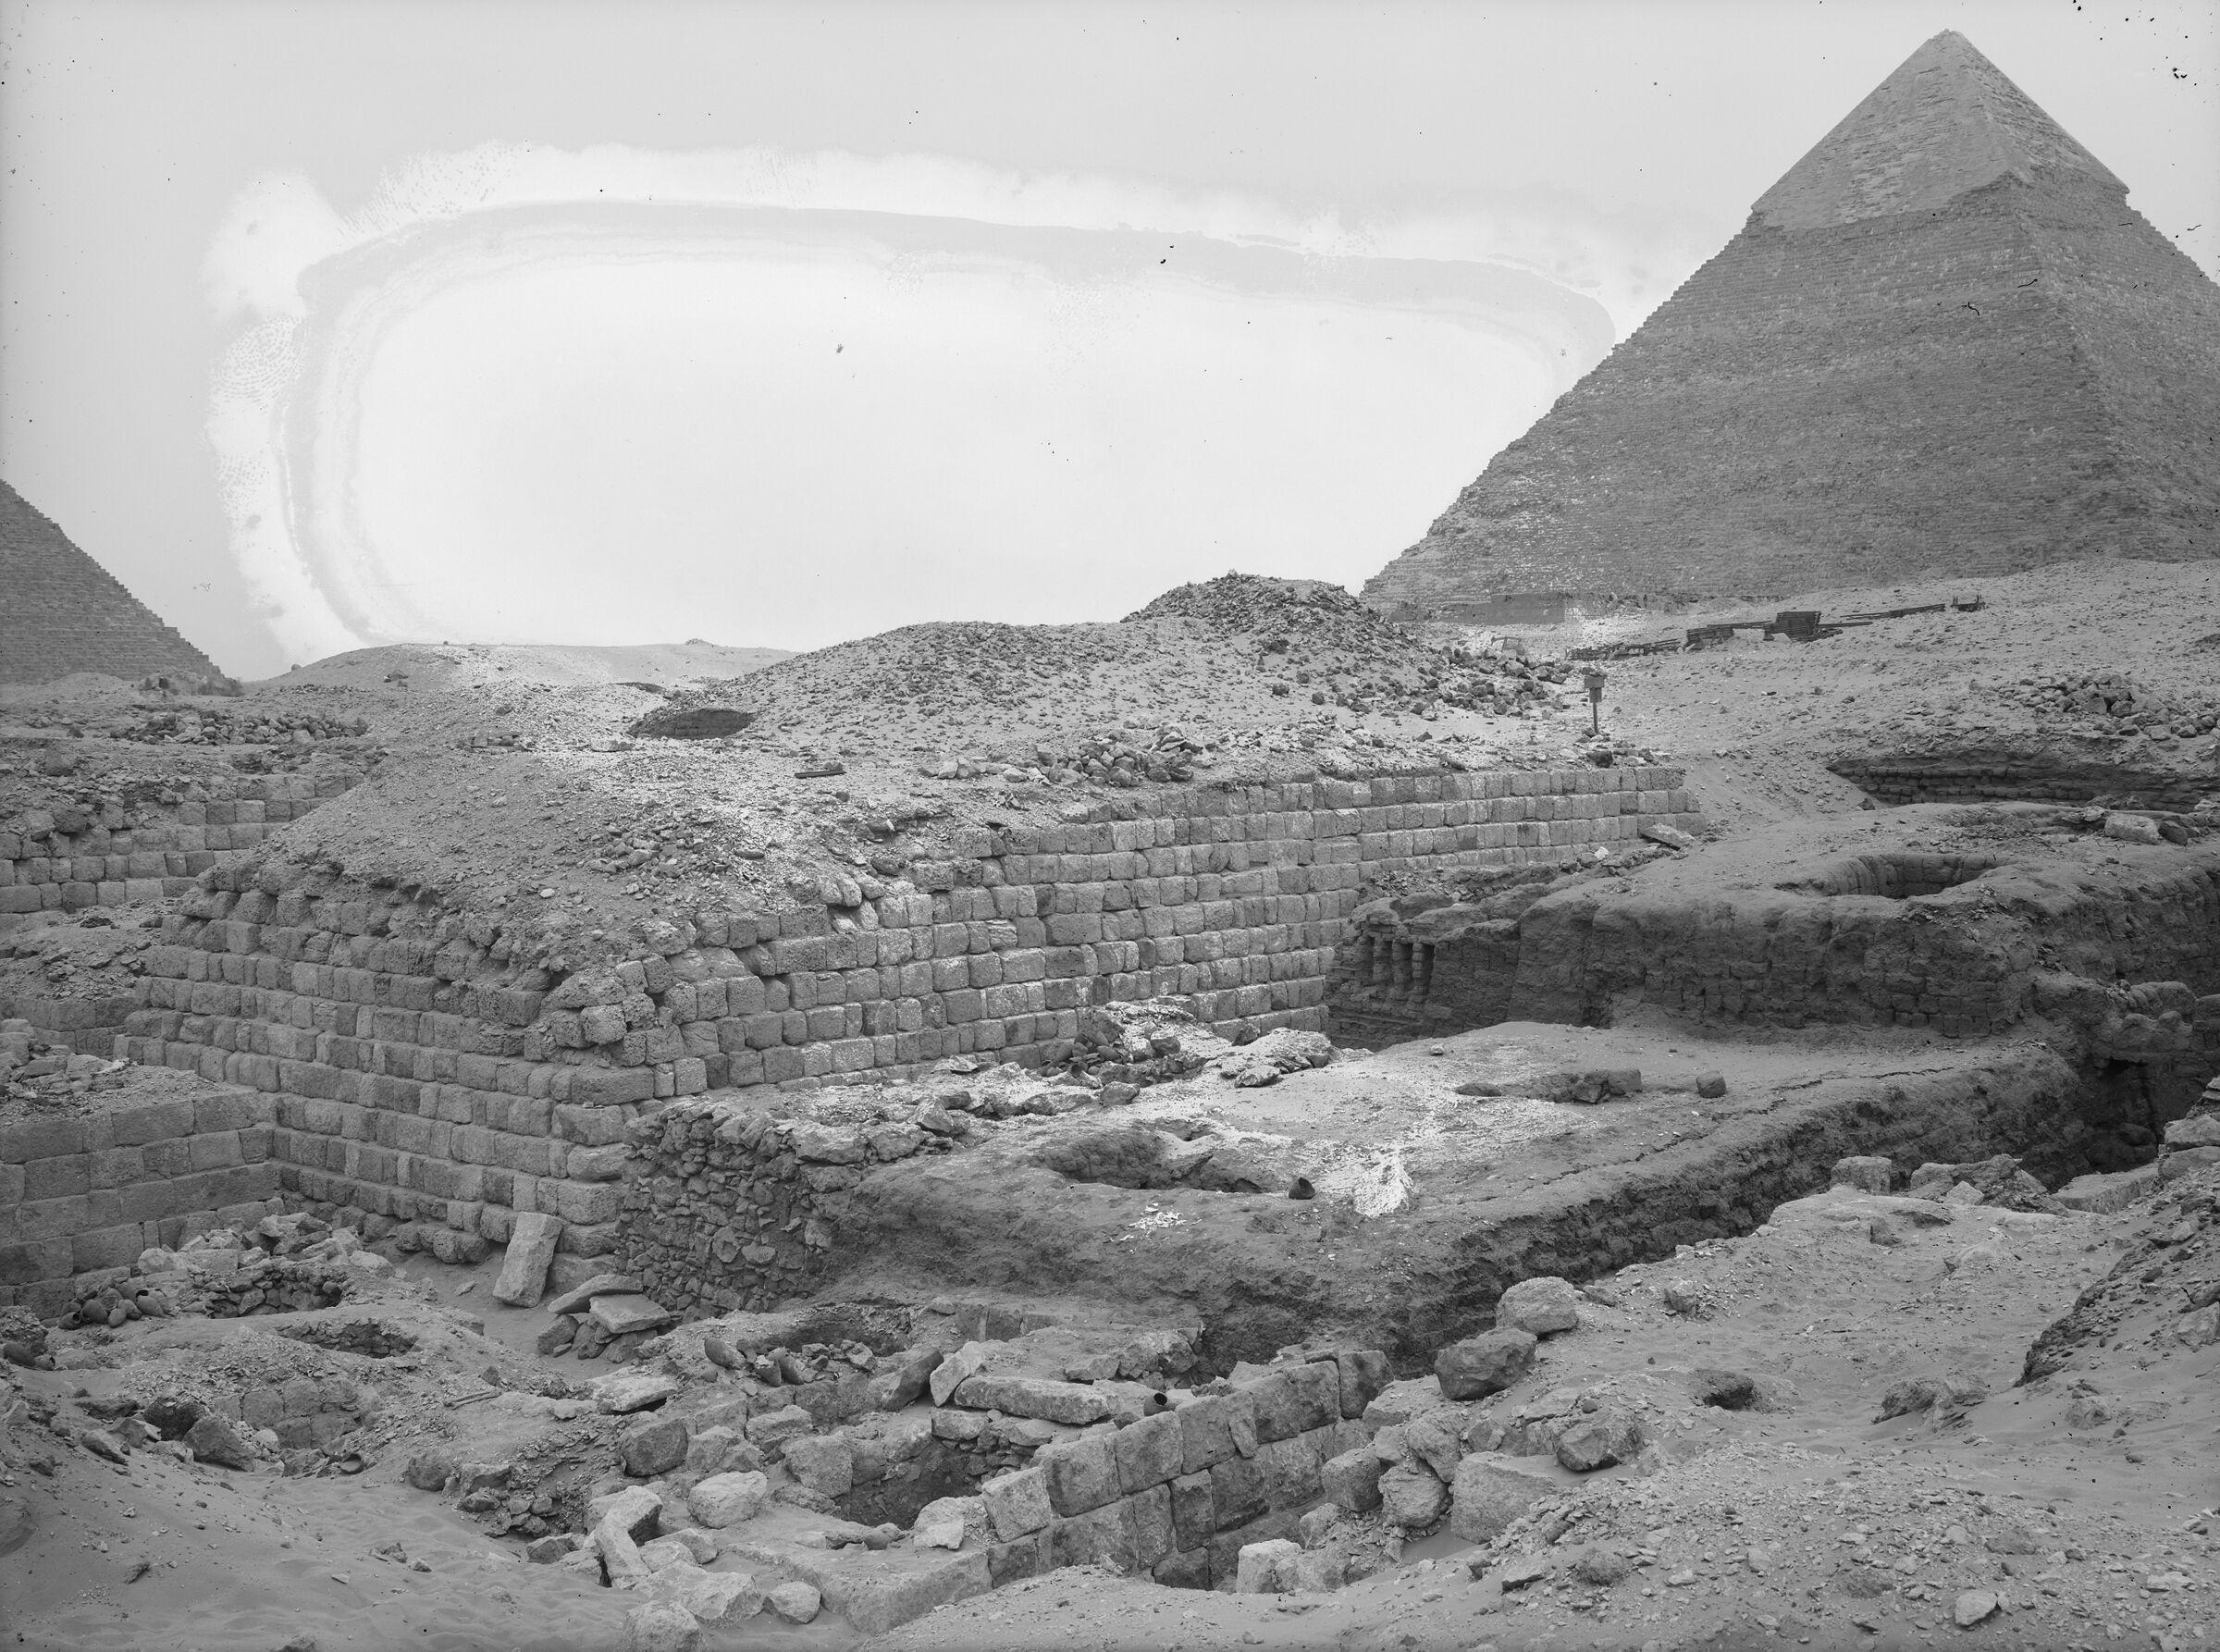 Western Cemetery: Site: Giza; View: G 1209, G 1407, G 1404, G 1405, G 1403